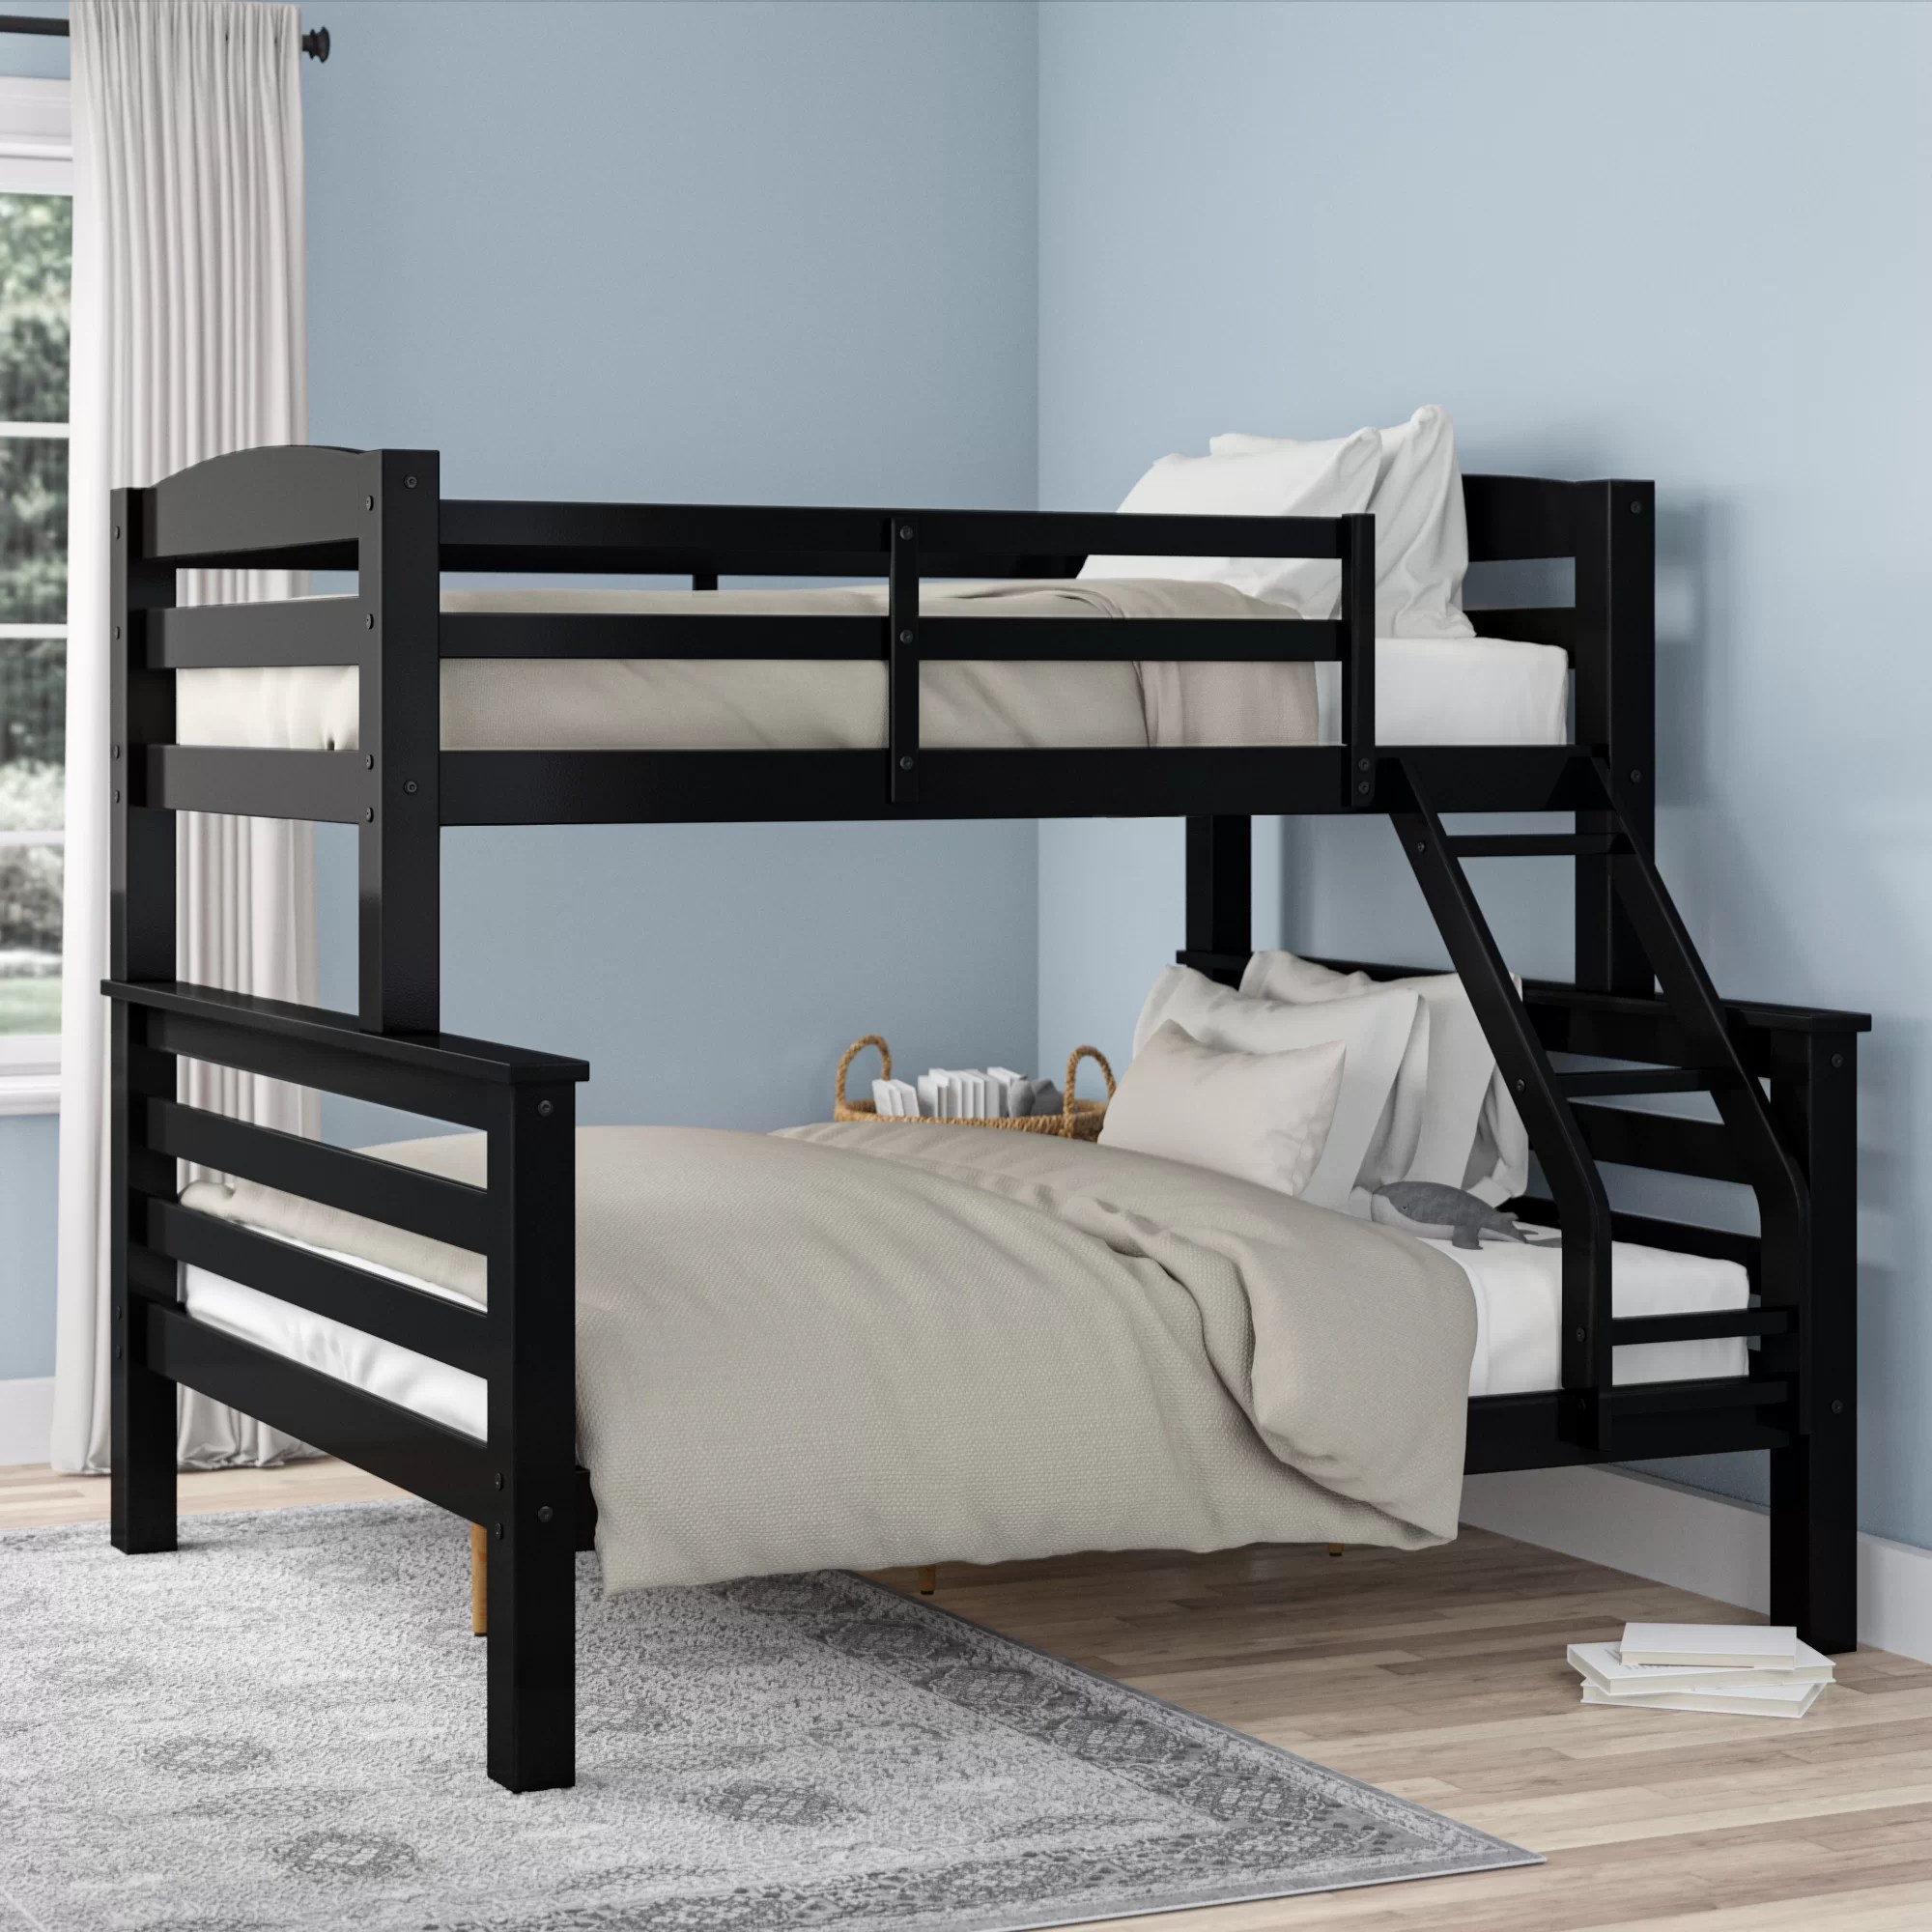 Harriet Bee Jailyn Twin Over Full Bunk Bed Reviews